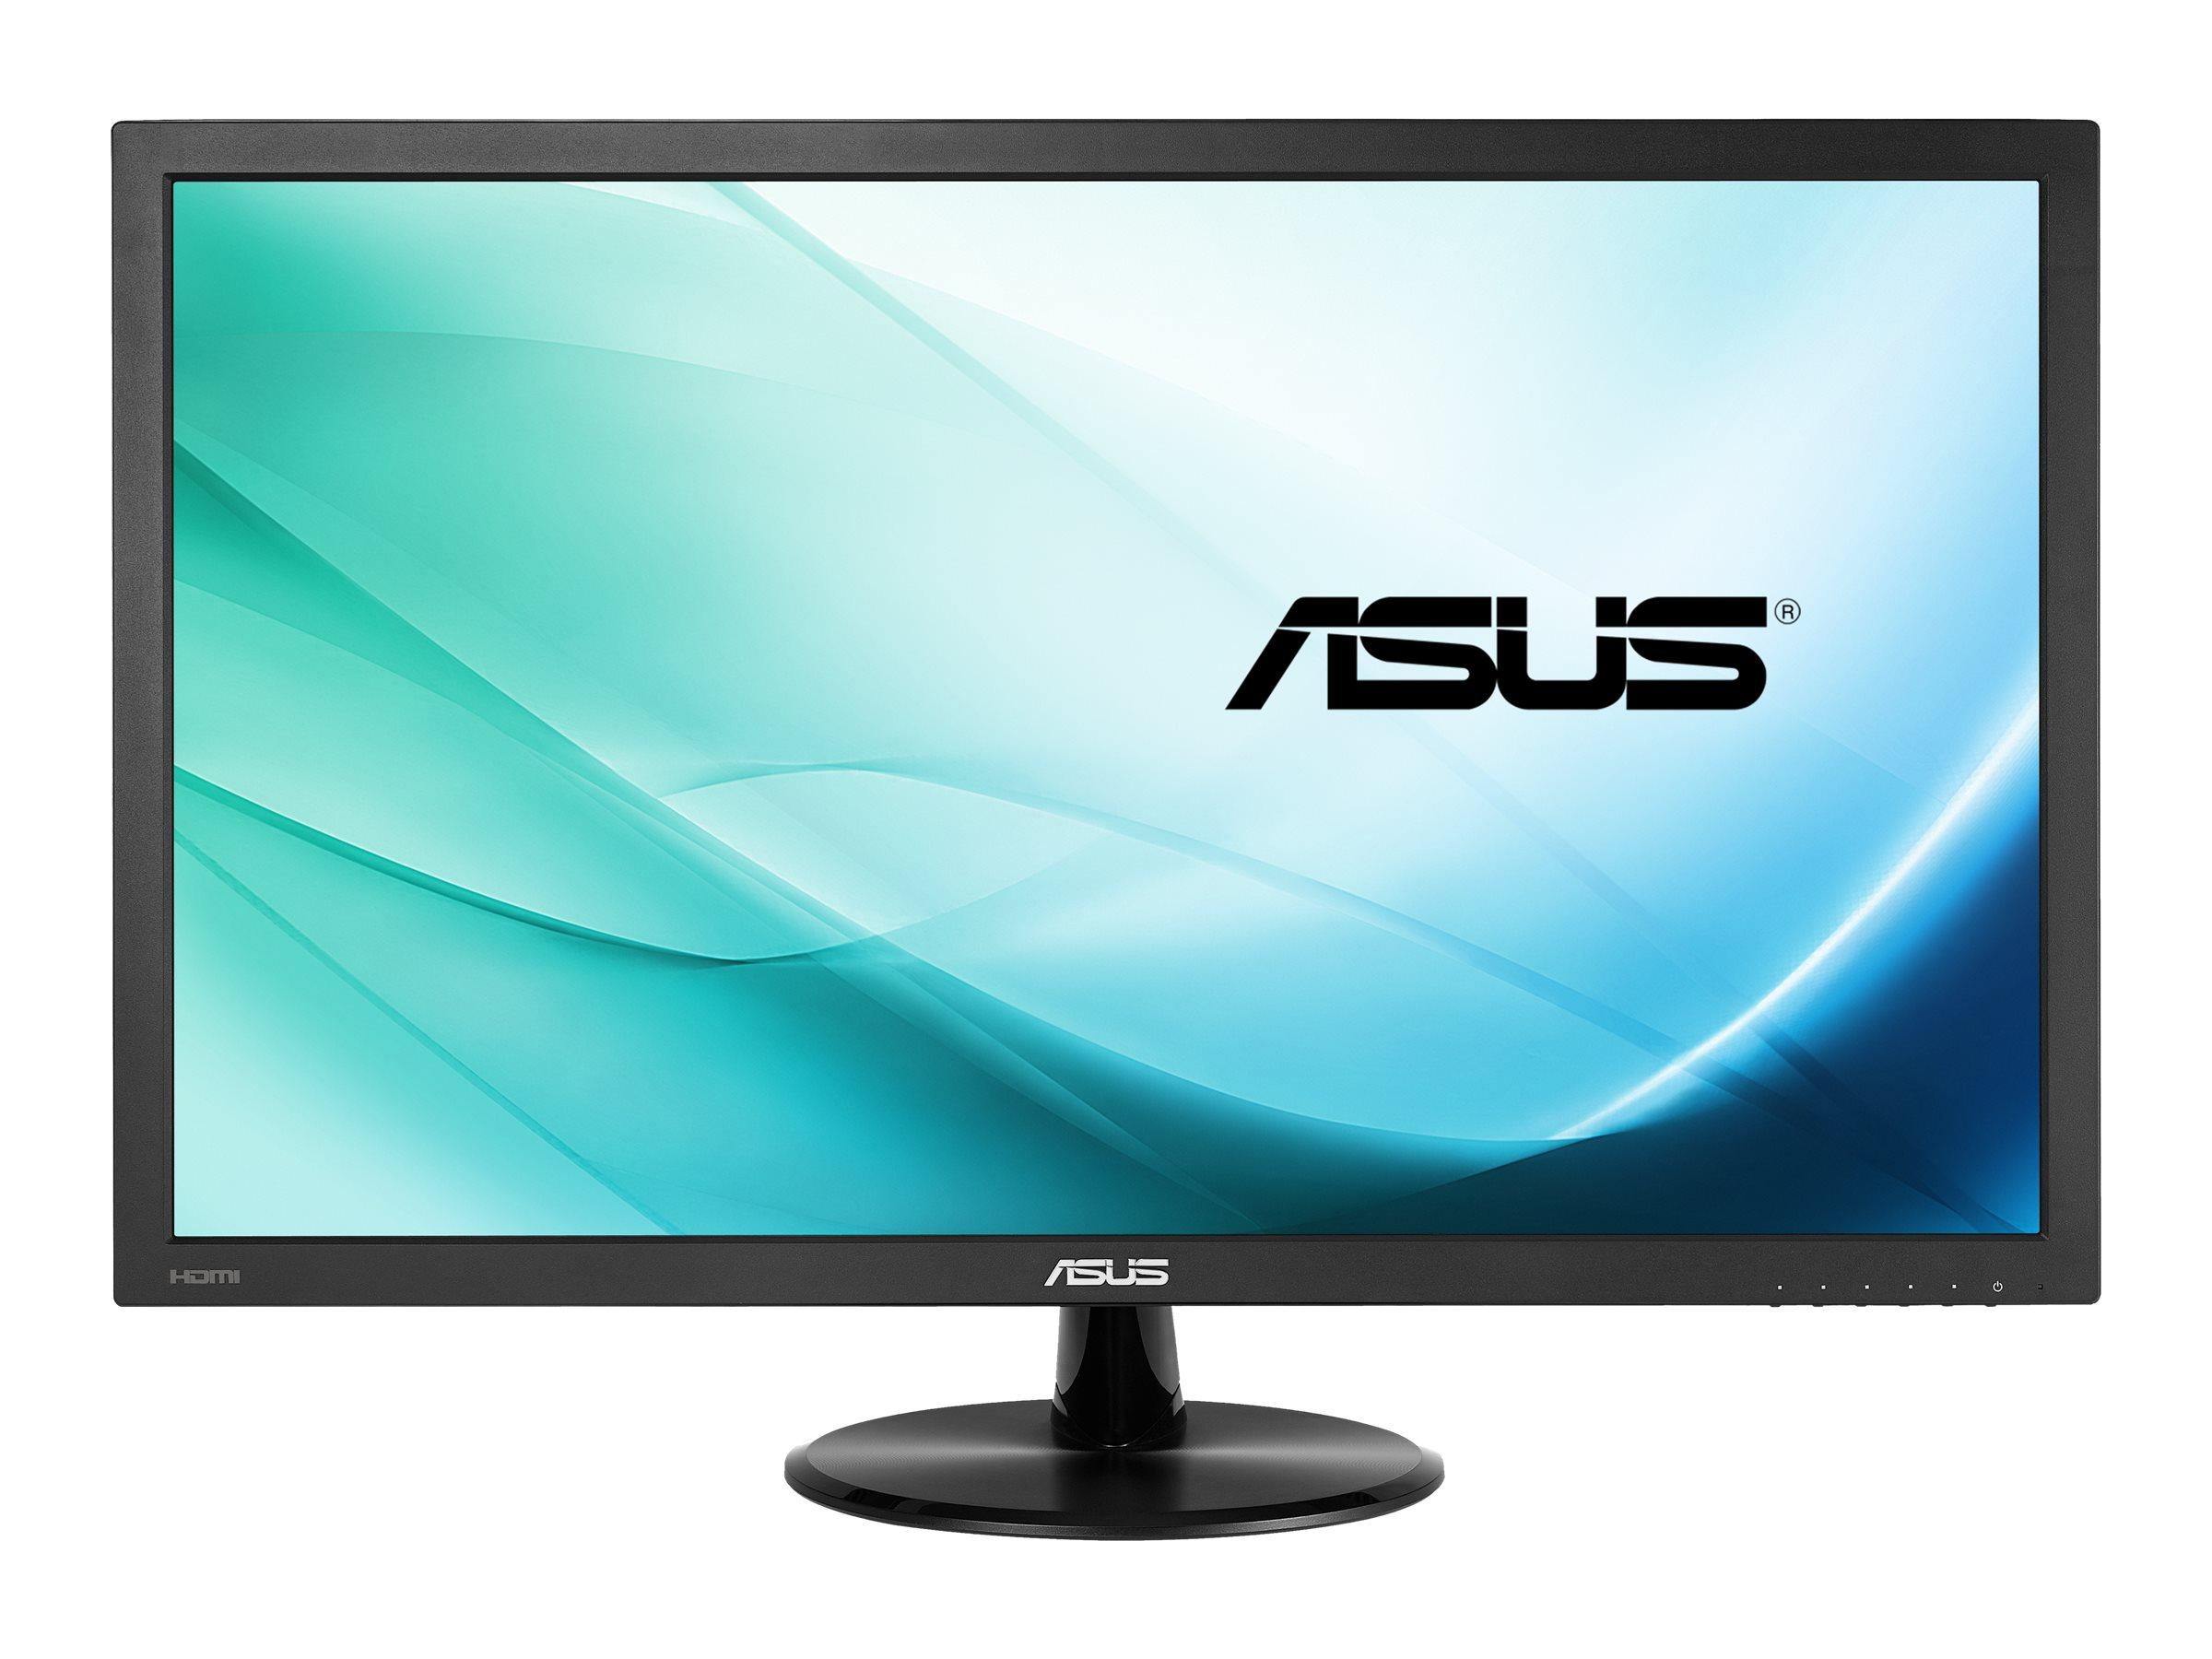 ASUS VP228H - LED-Monitor - 54.6 cm (21.5